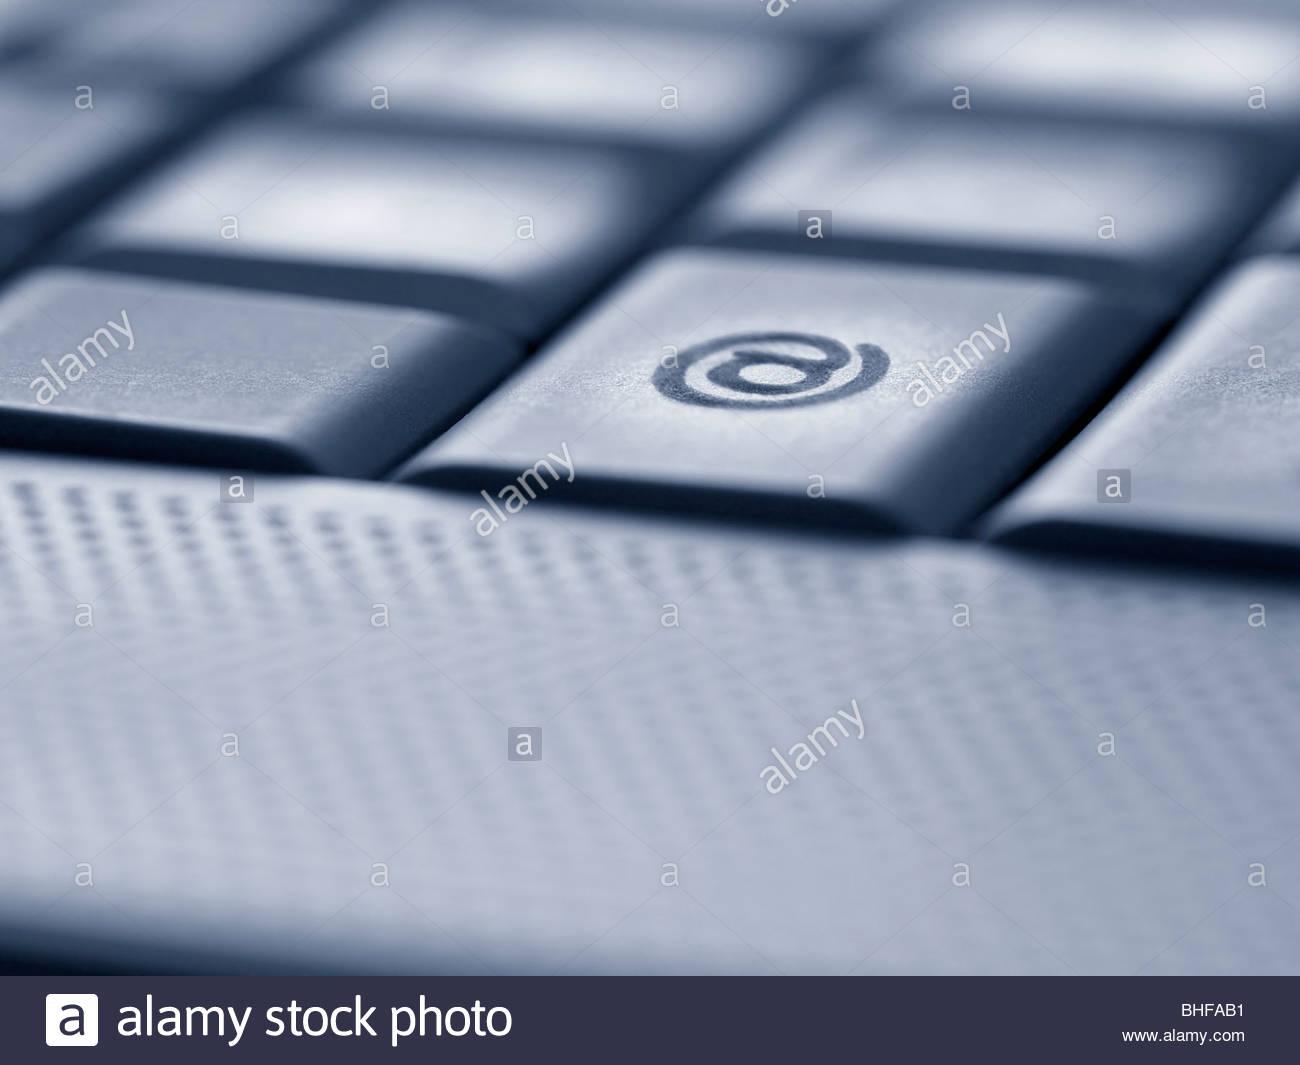 Close up of the at symbol key on computer keyboard - Stock Image